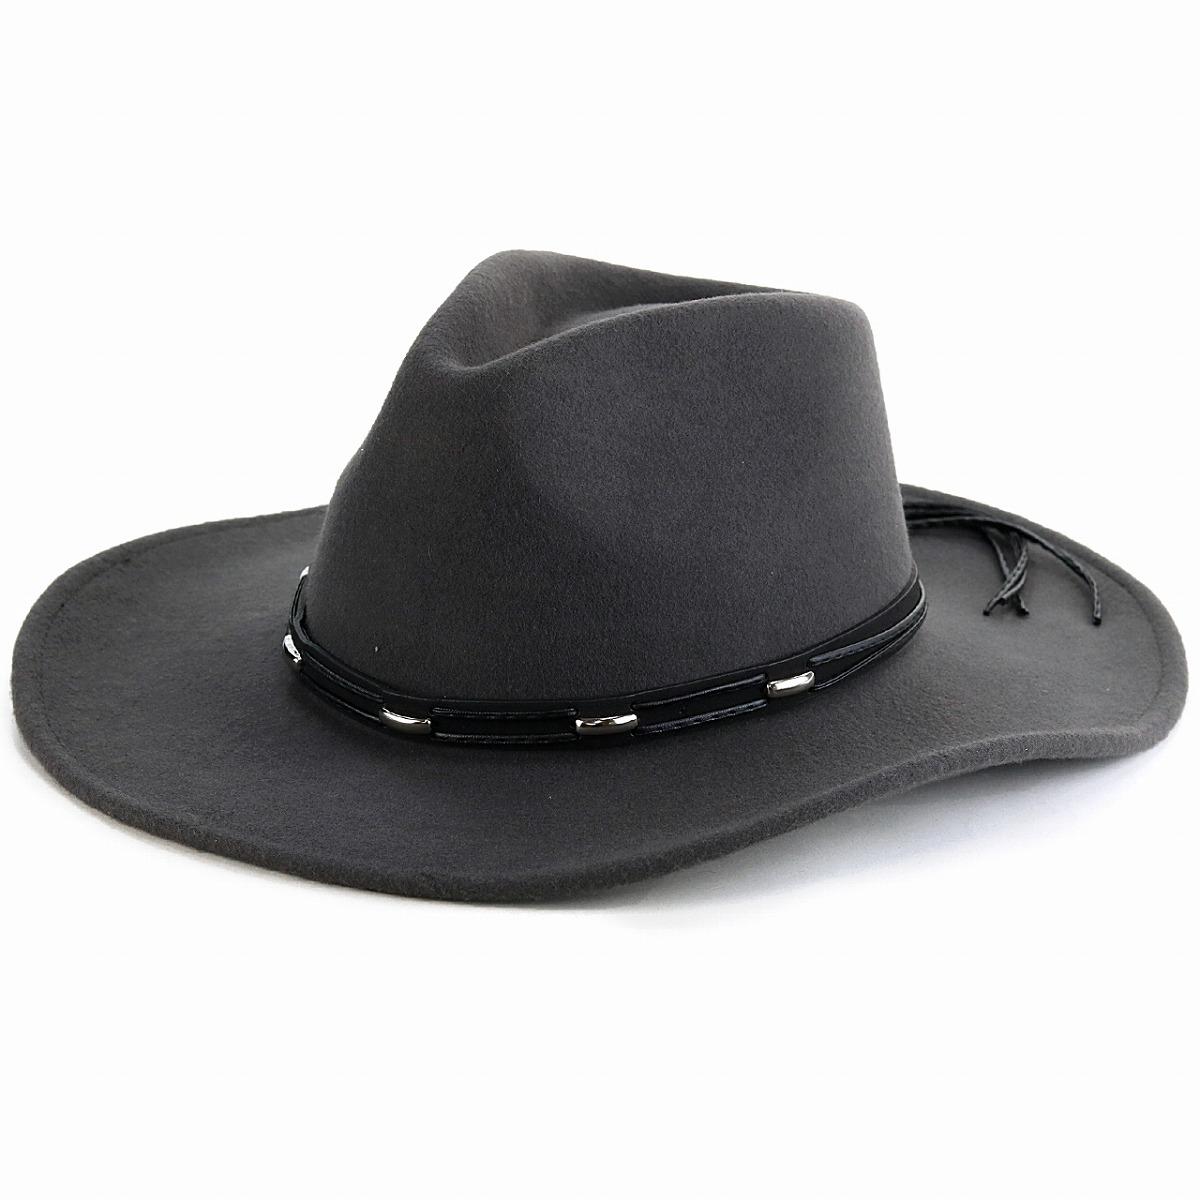 ELEHELM HAT STORE  KennyK cowboy hat men wool 100% felt hat men western hat  soft felt hat wide yellowtail heat Dis saliva wide hat chic LTC charcoal    gray ... fafe325349f